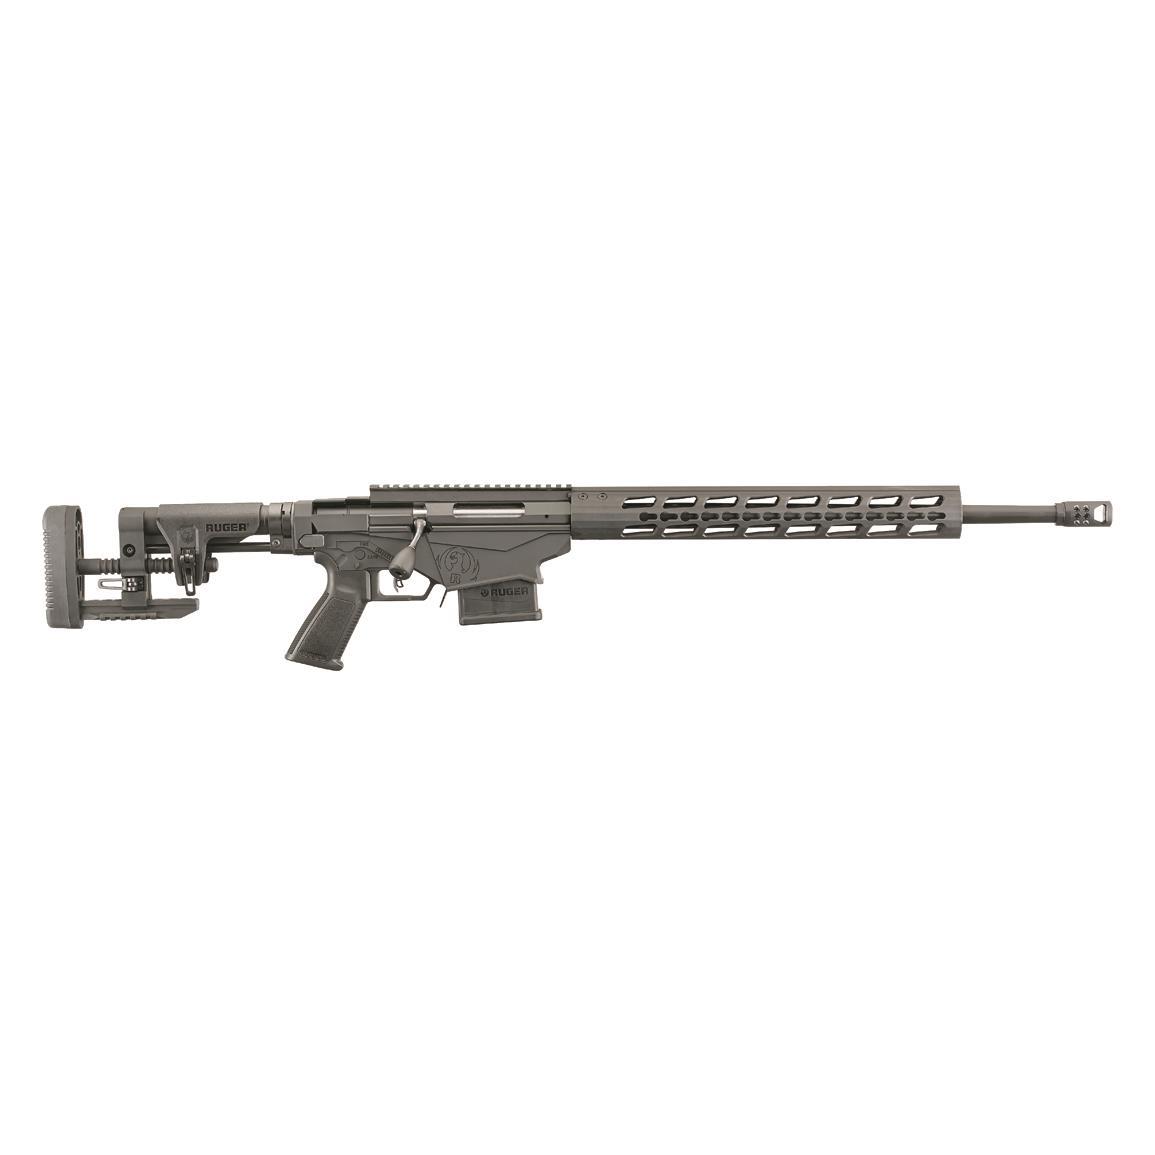 Ruger Precision Rifle 308 Gen 2